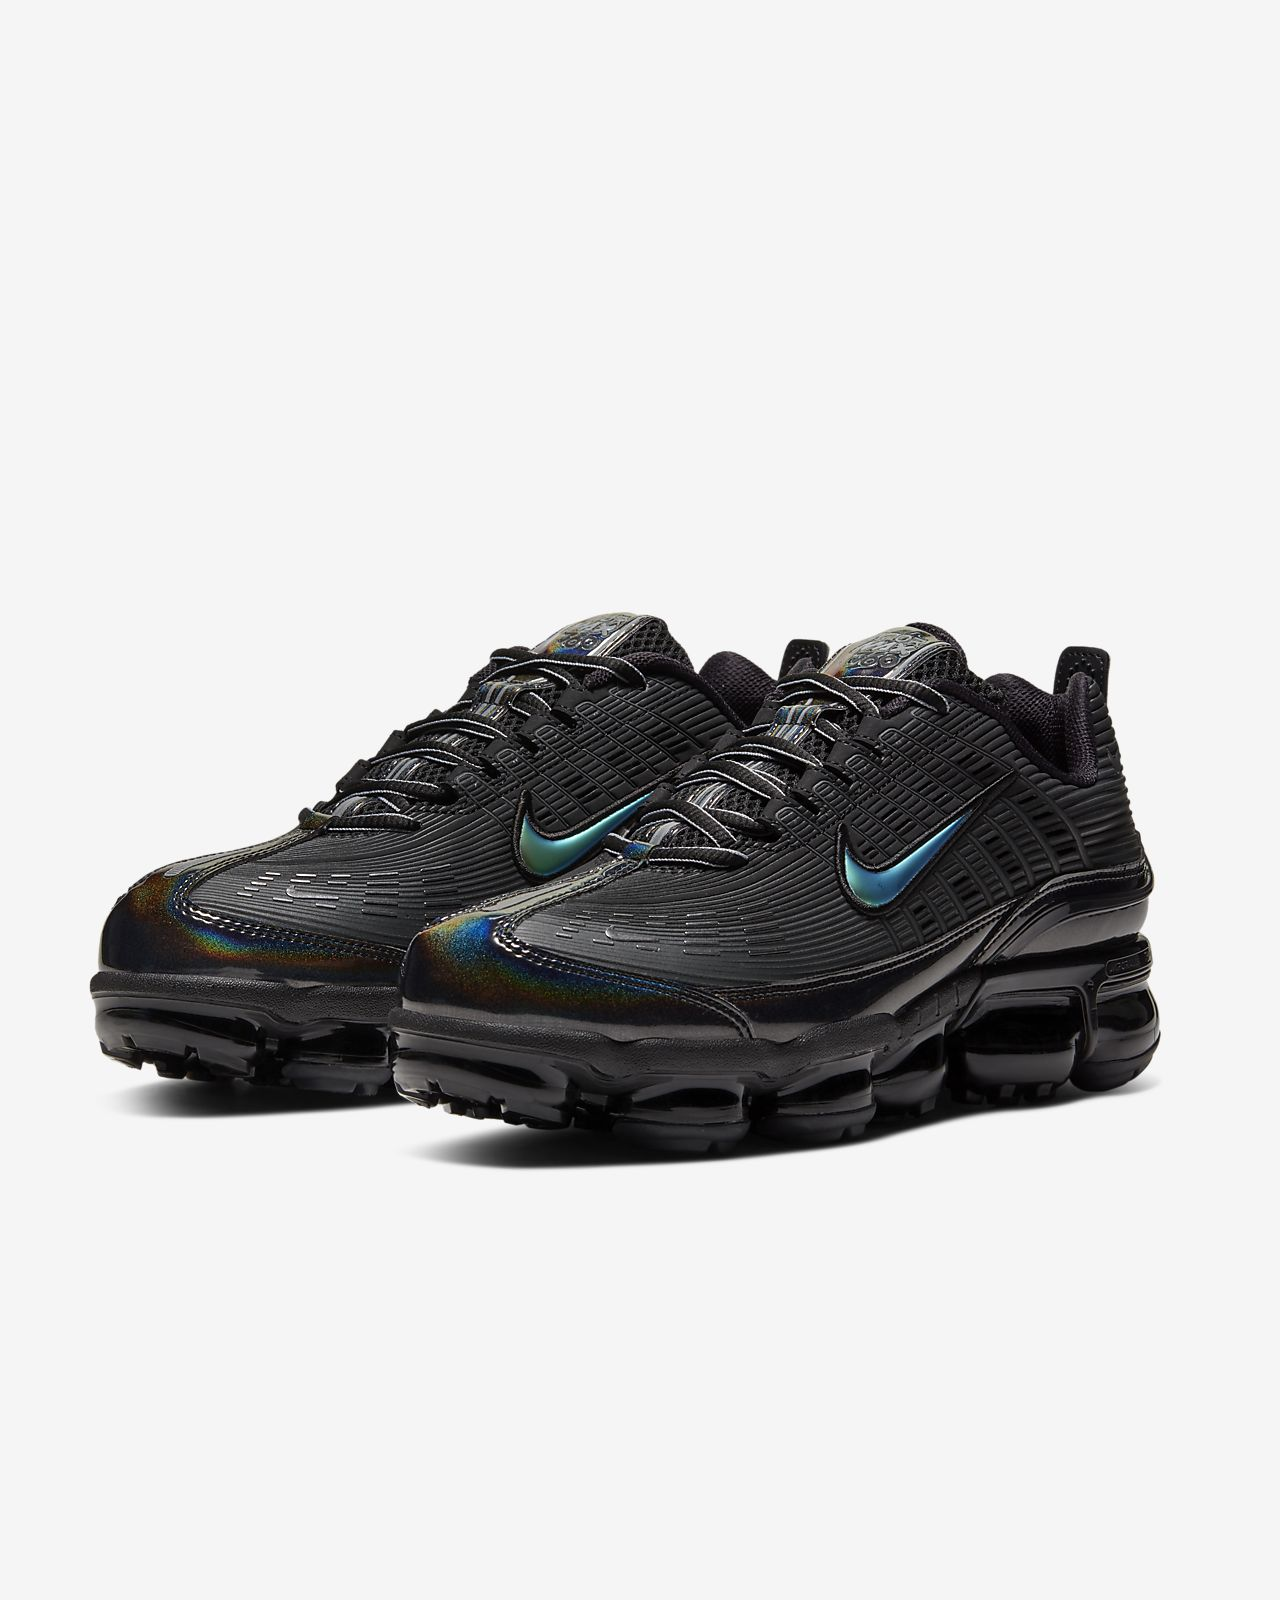 Nike Air Jordan 11 Retro BG (Free Shipping)